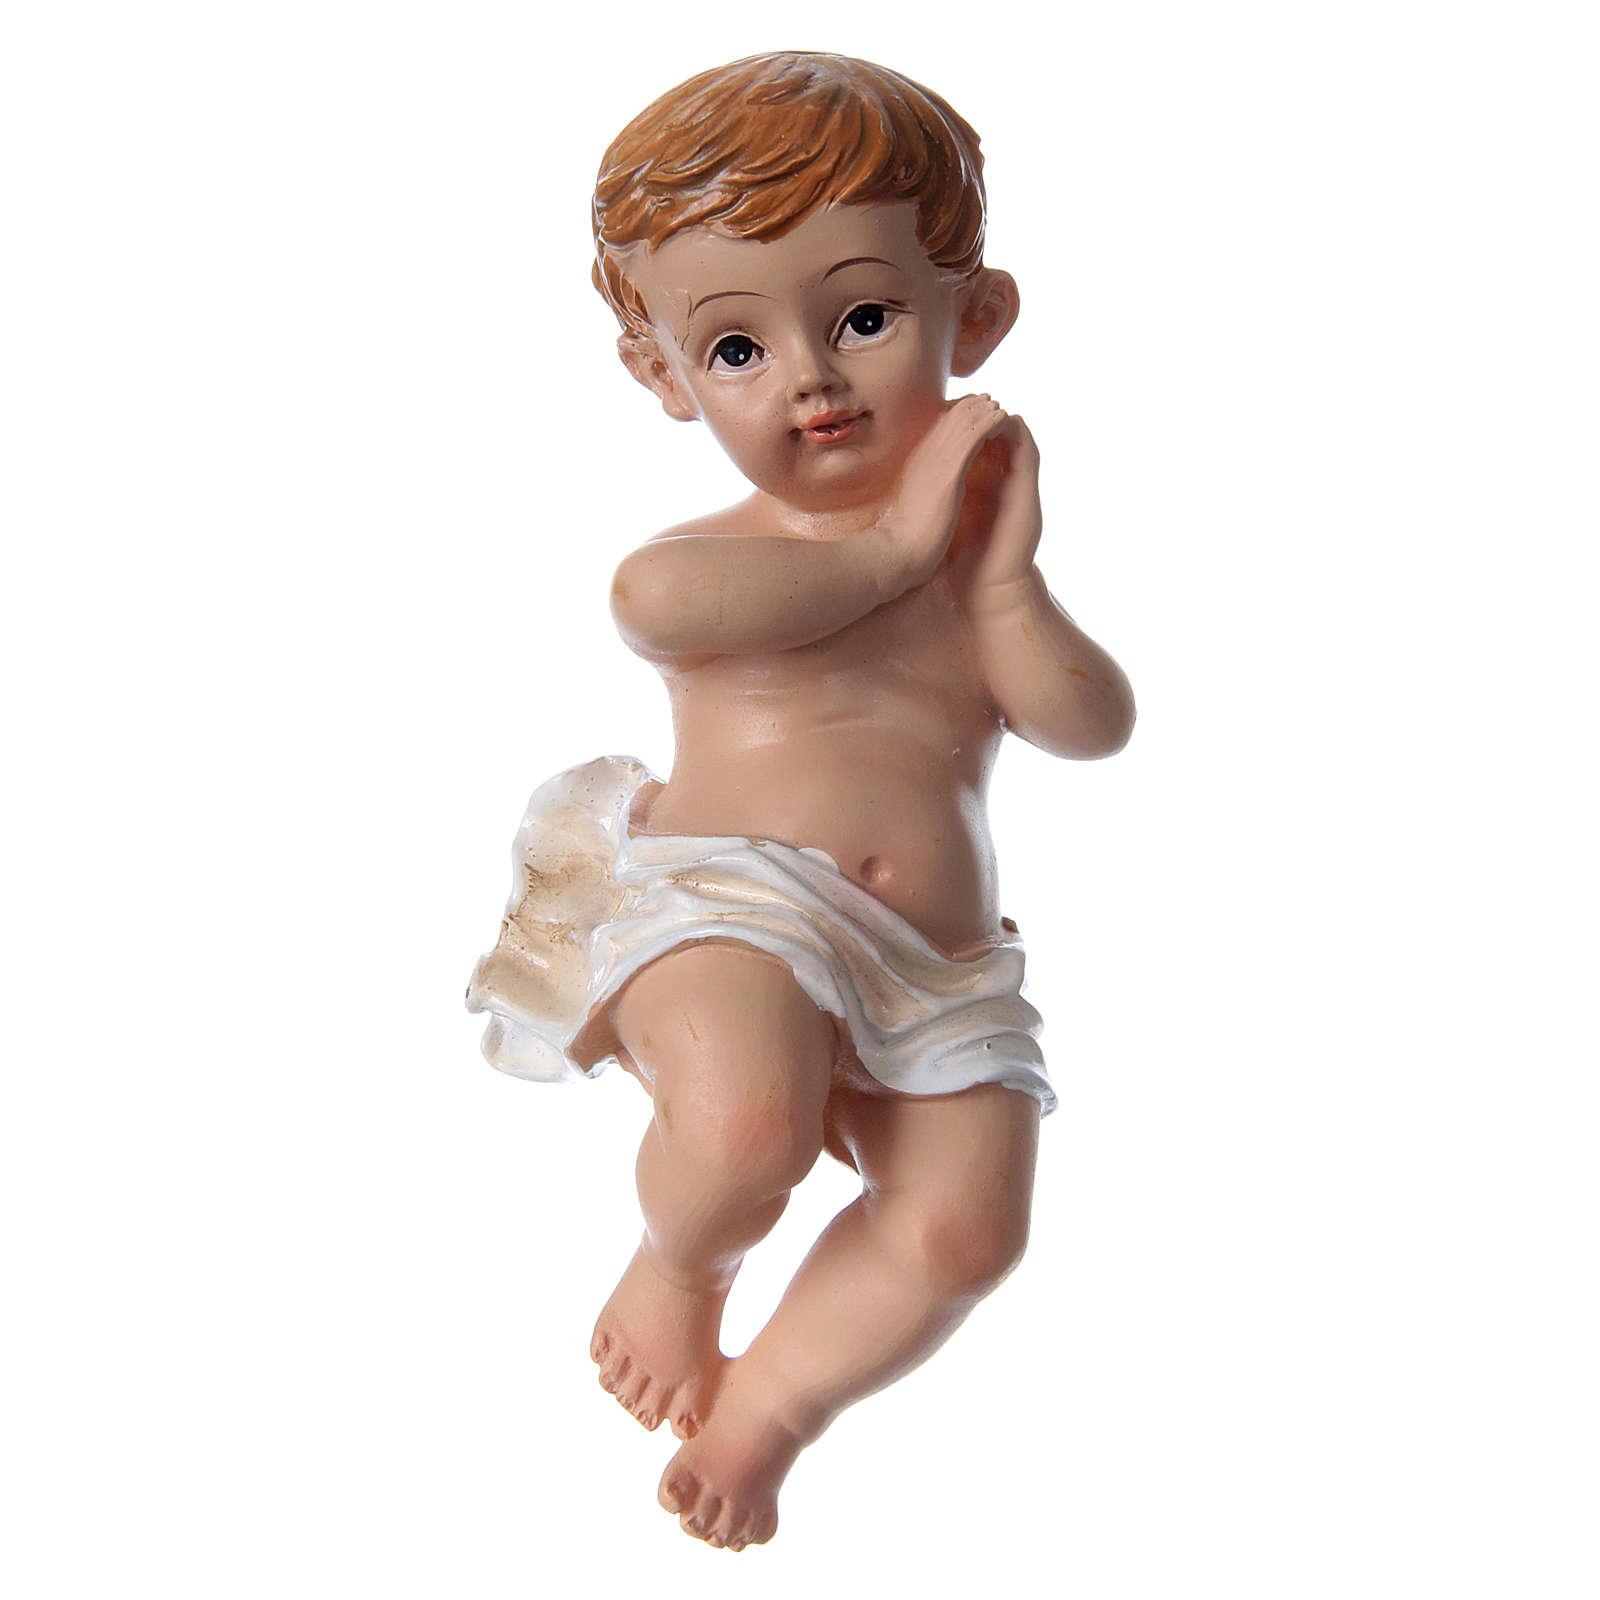 Statuina Bambinello h reale 10 cm resina 3